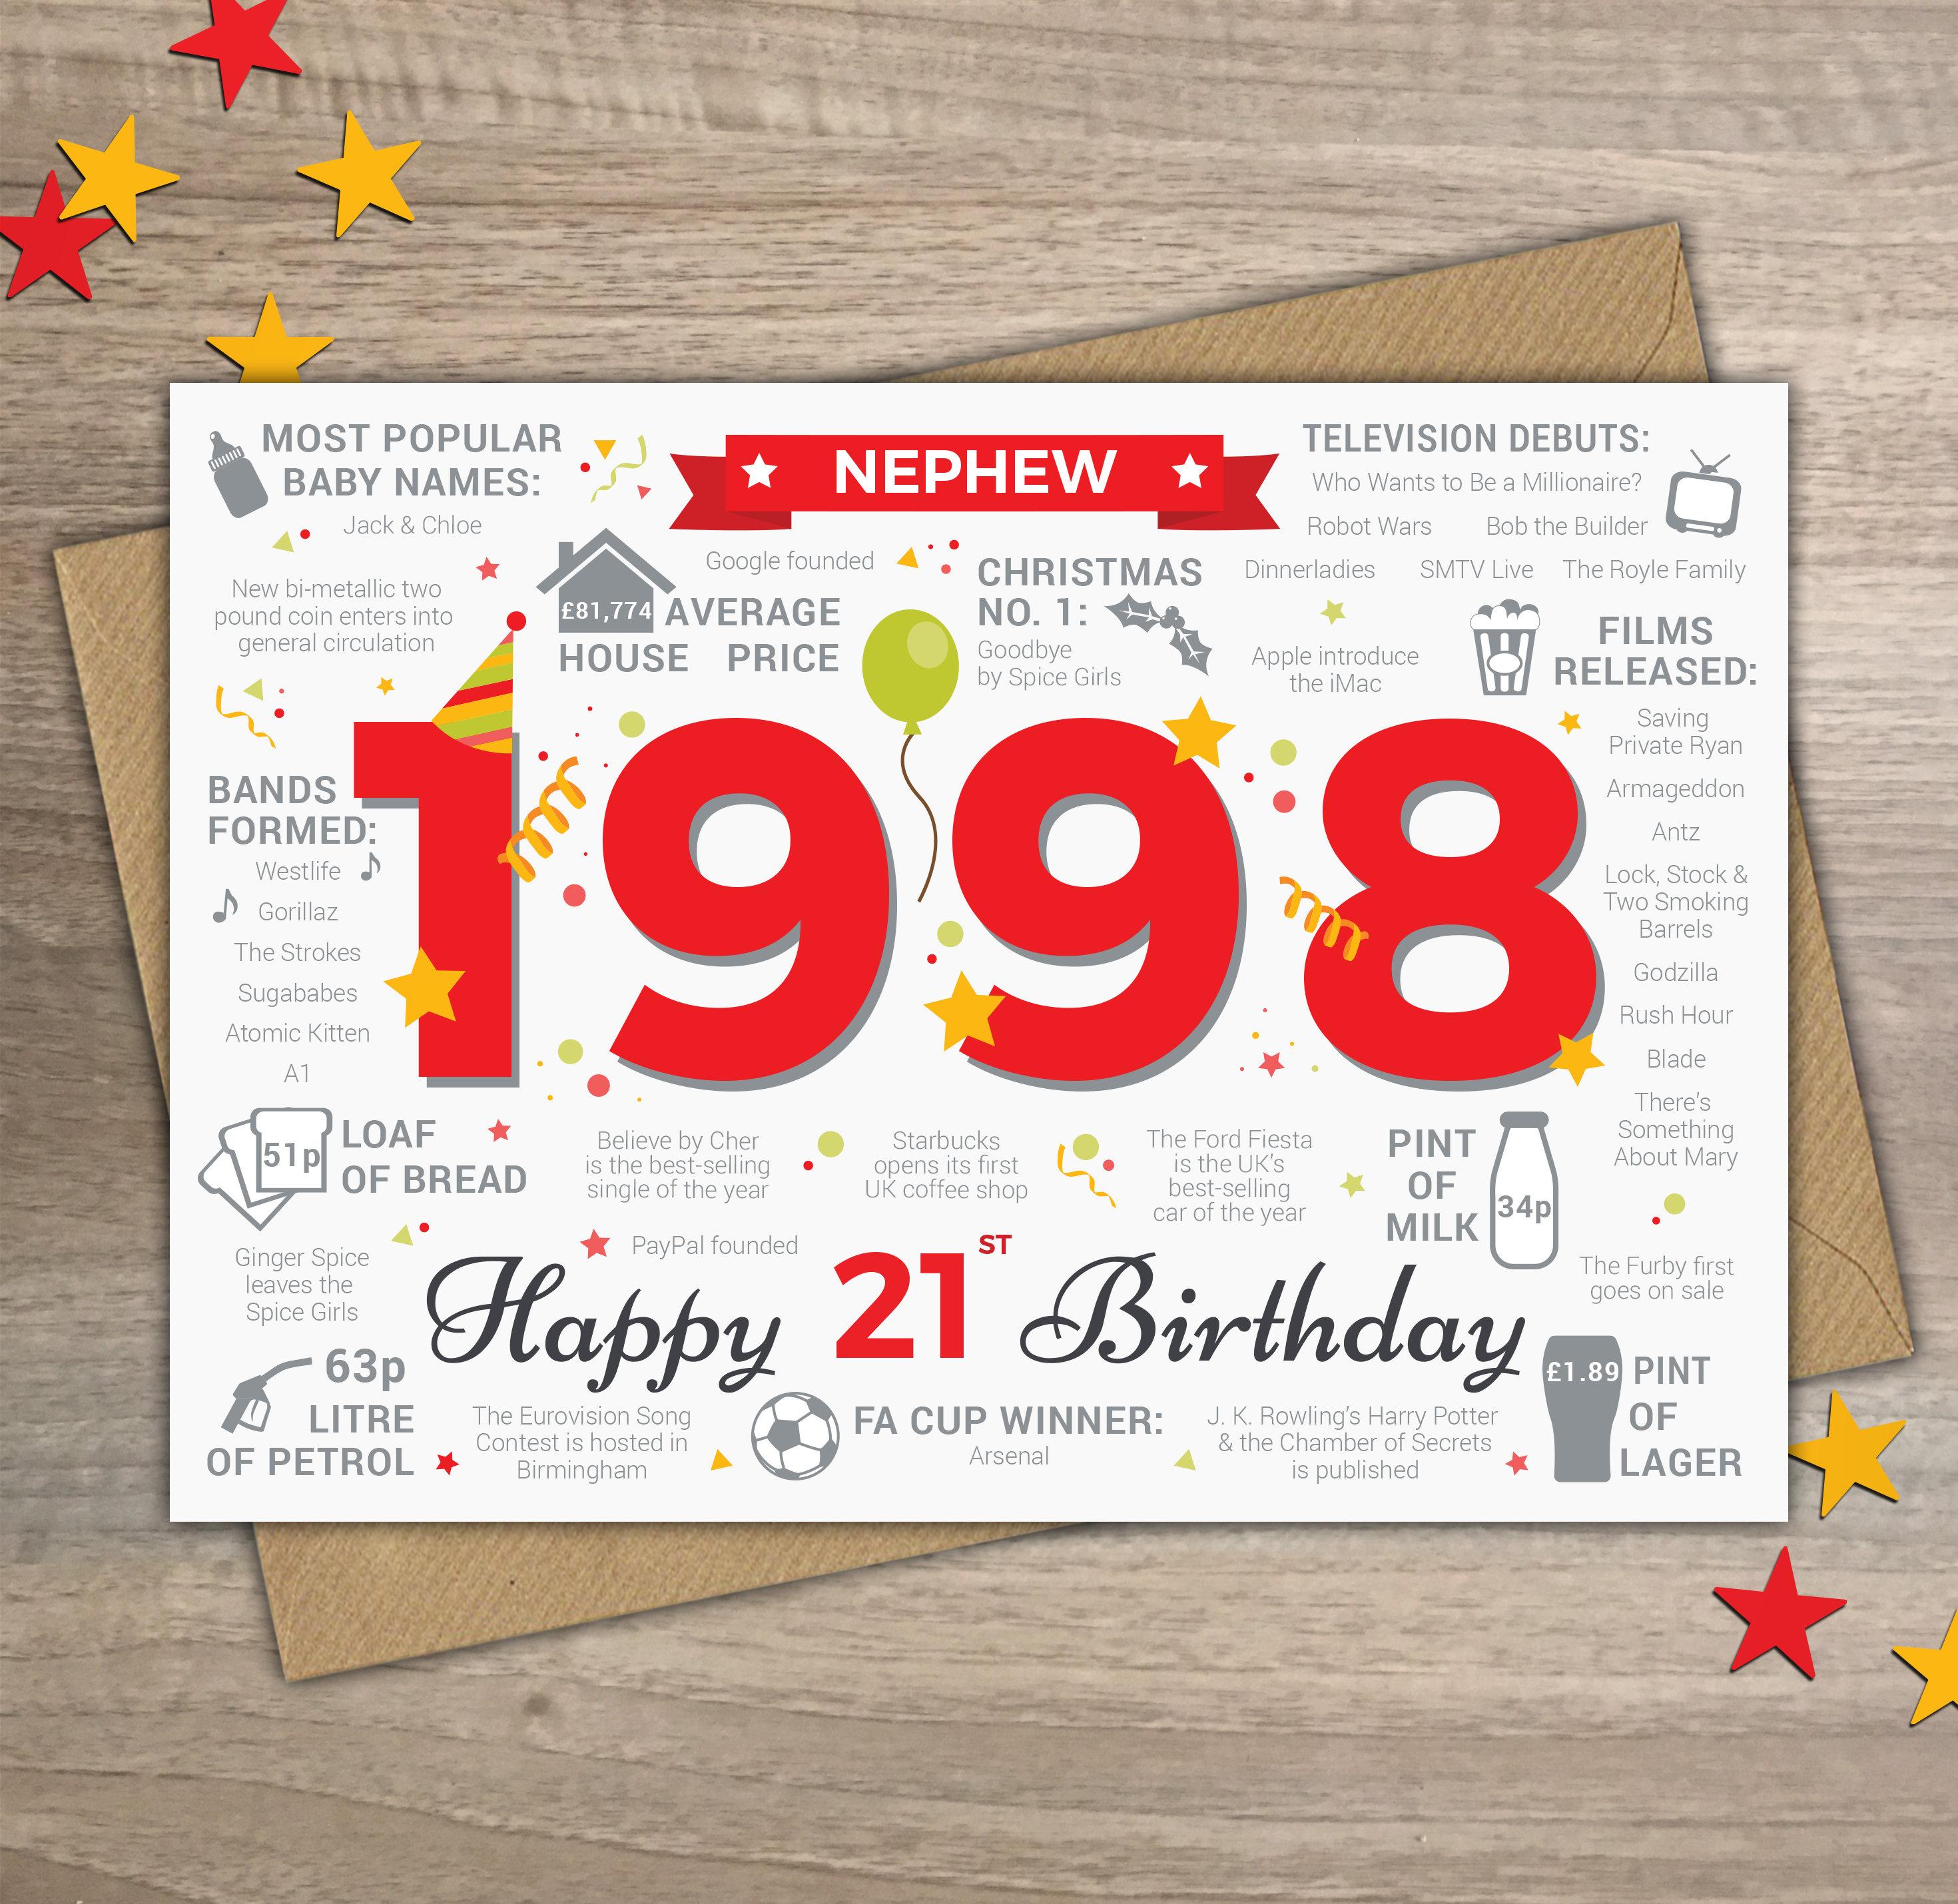 Happy 21st Birthday NEPHEW Greetings Card Born In 1998 Year